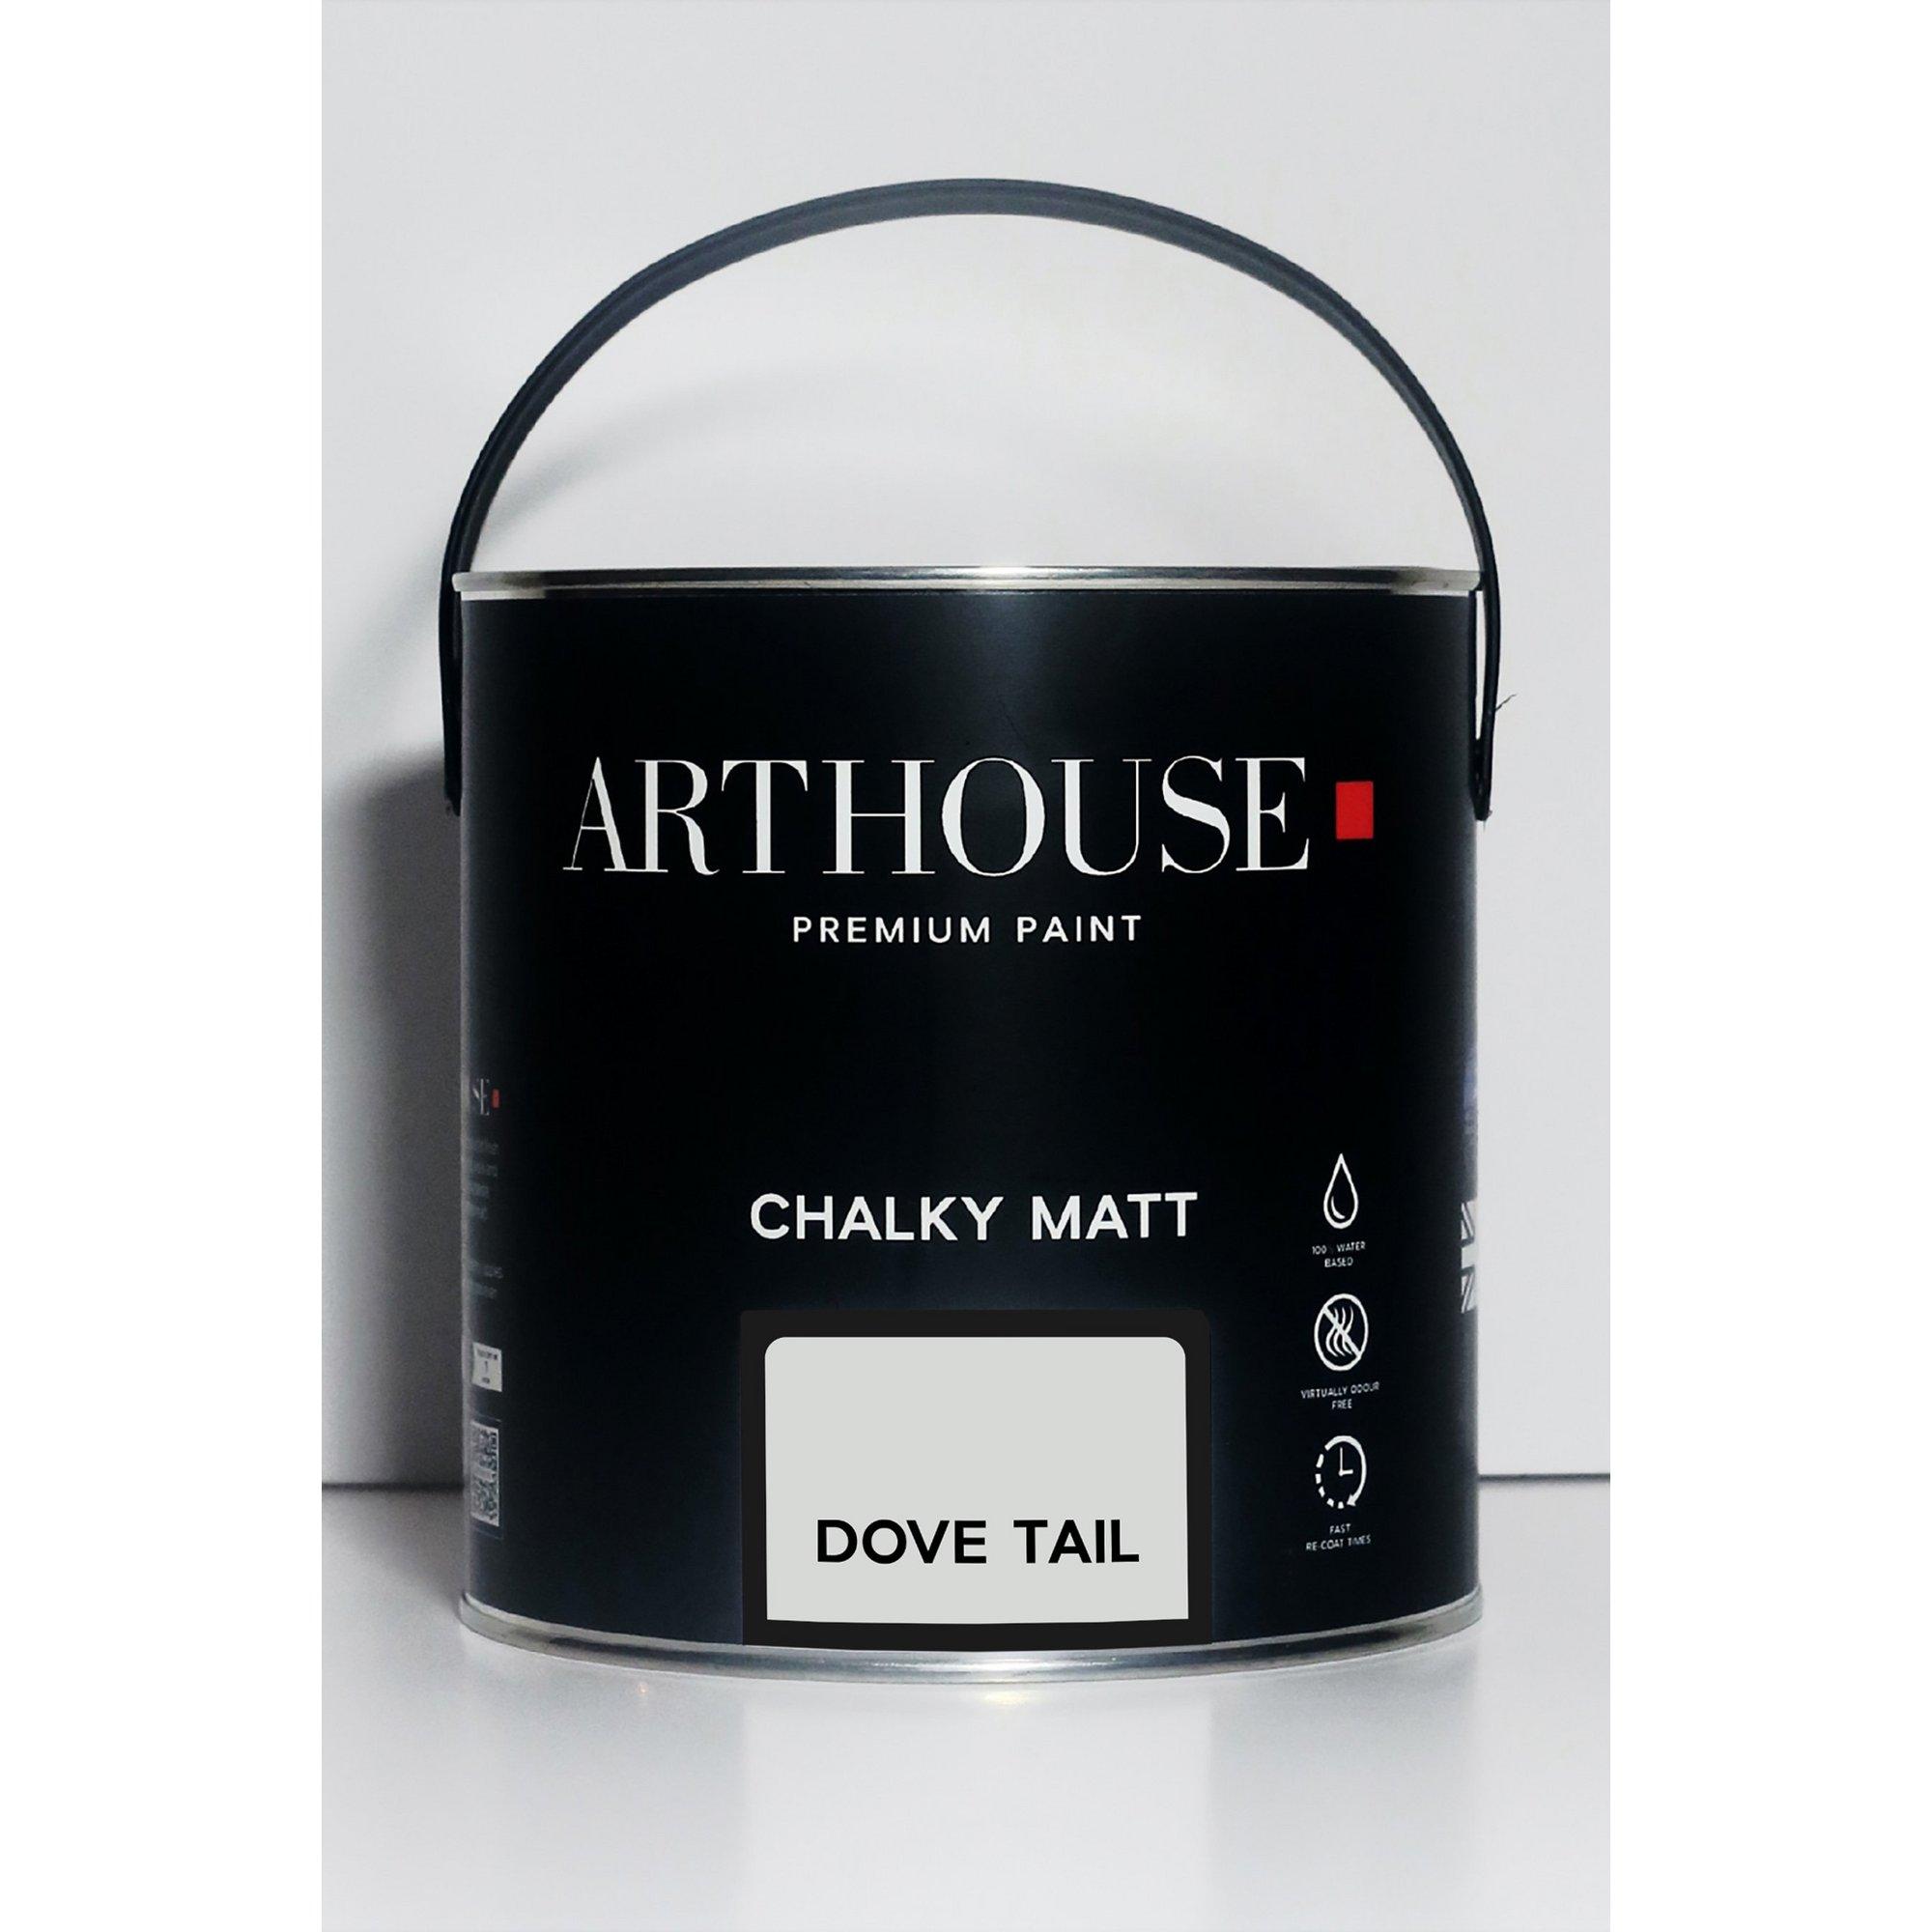 Image of Chalky Matt Dove Tail Emulsion Paint